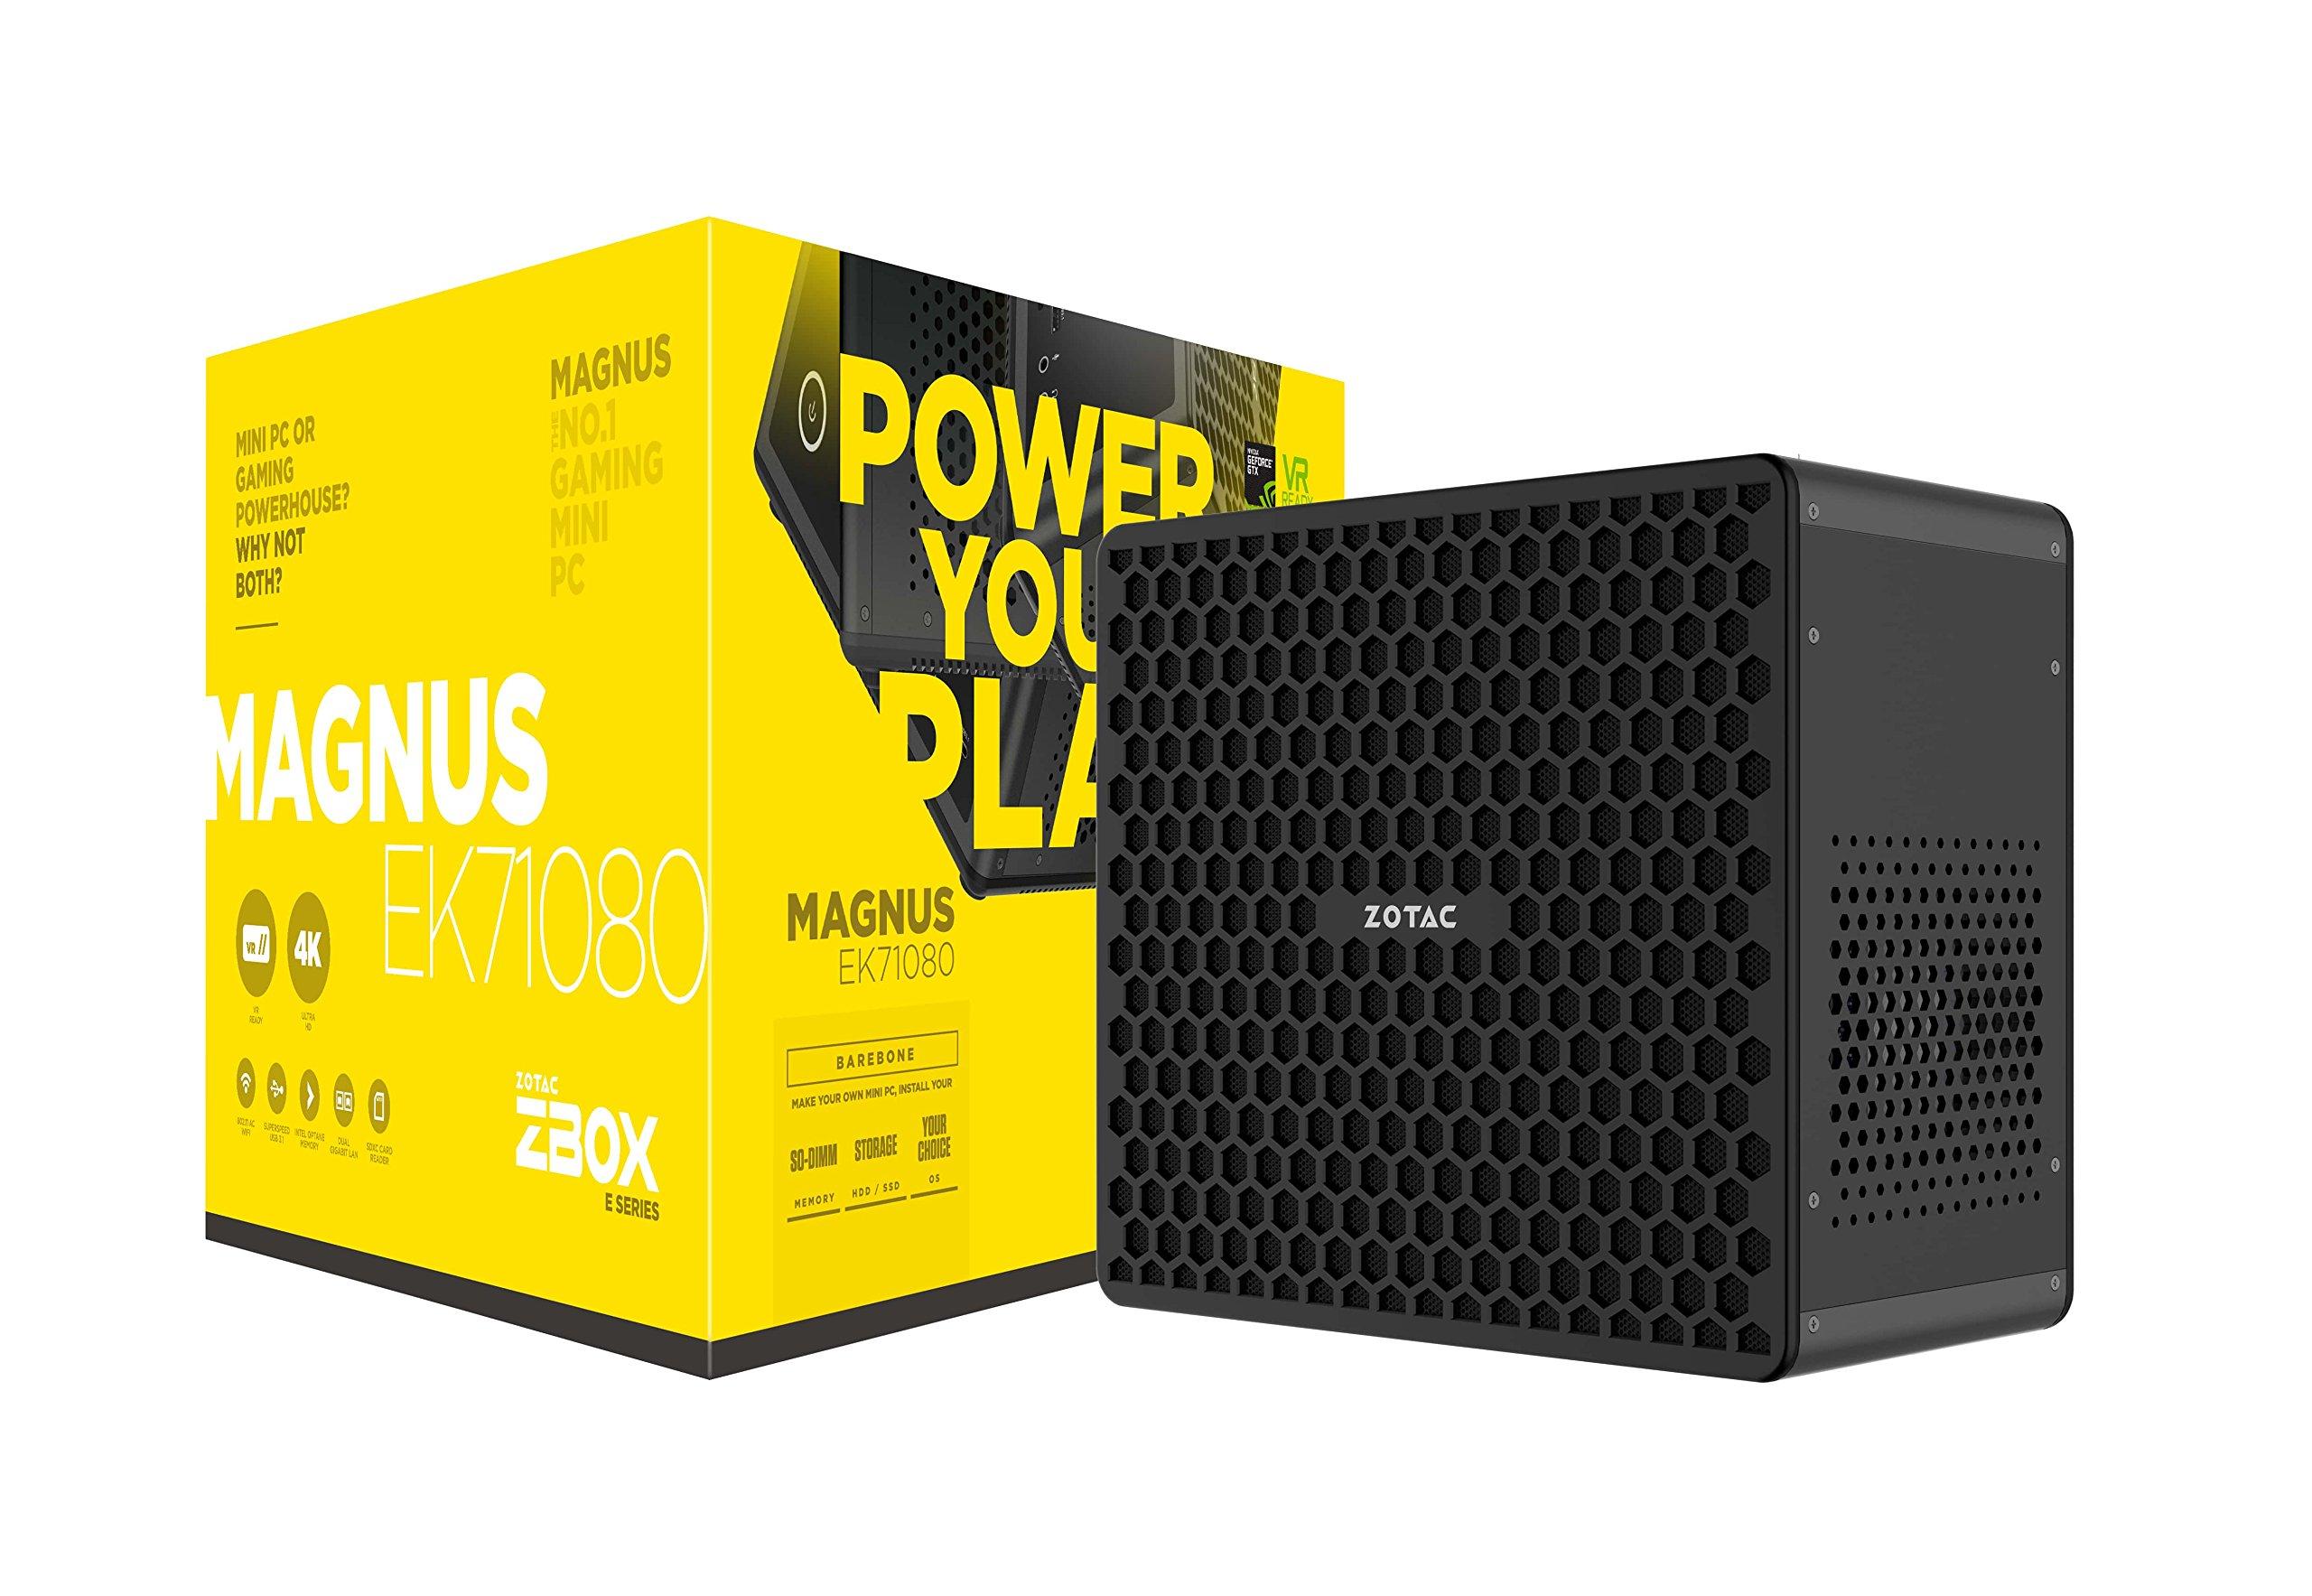 ZOTAC ZBOX-EK71080-U MAGNUS EK71080 Gaming Mini PC GeForce GTX 1080 Intel Core i7-7700HQ Barebone System